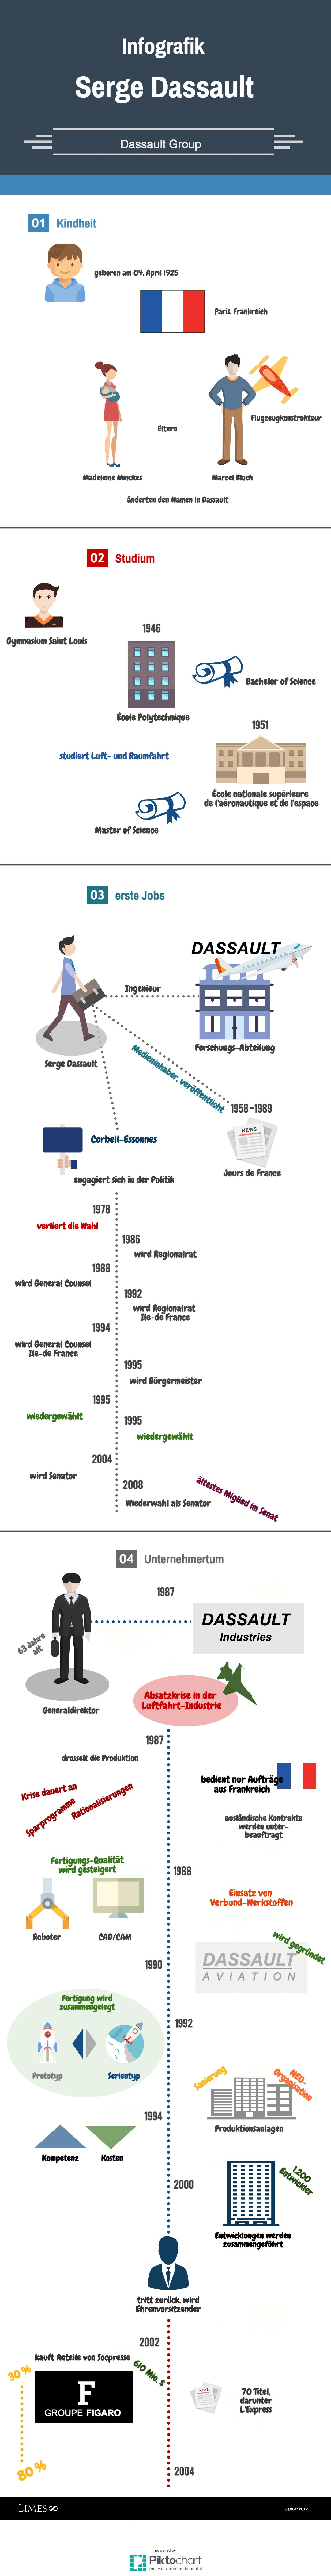 Informationsgrafik des Luftfahrt-Milliardärs Serge Dassault